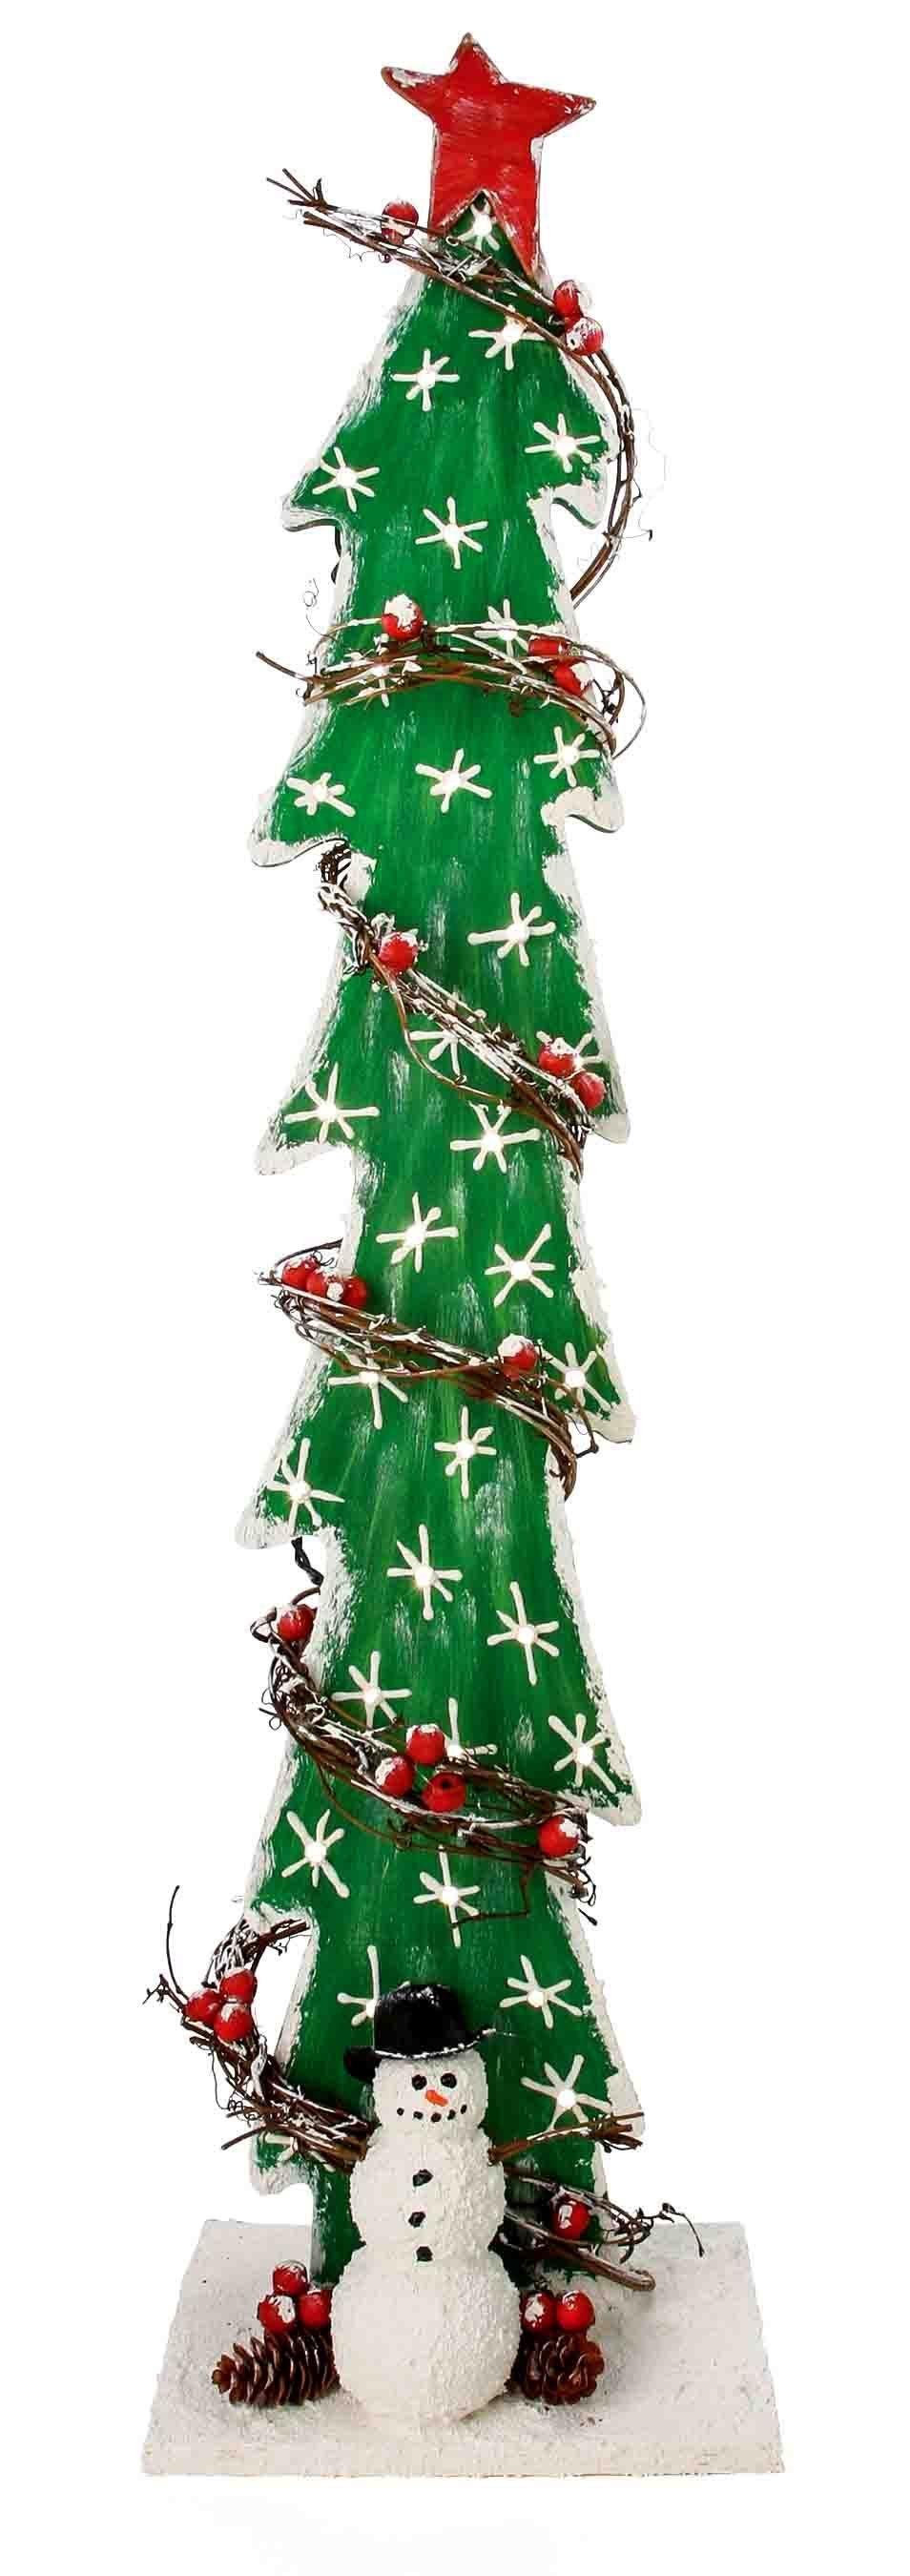 Easy Christmas Tree Decor With Lighting Ideas 21